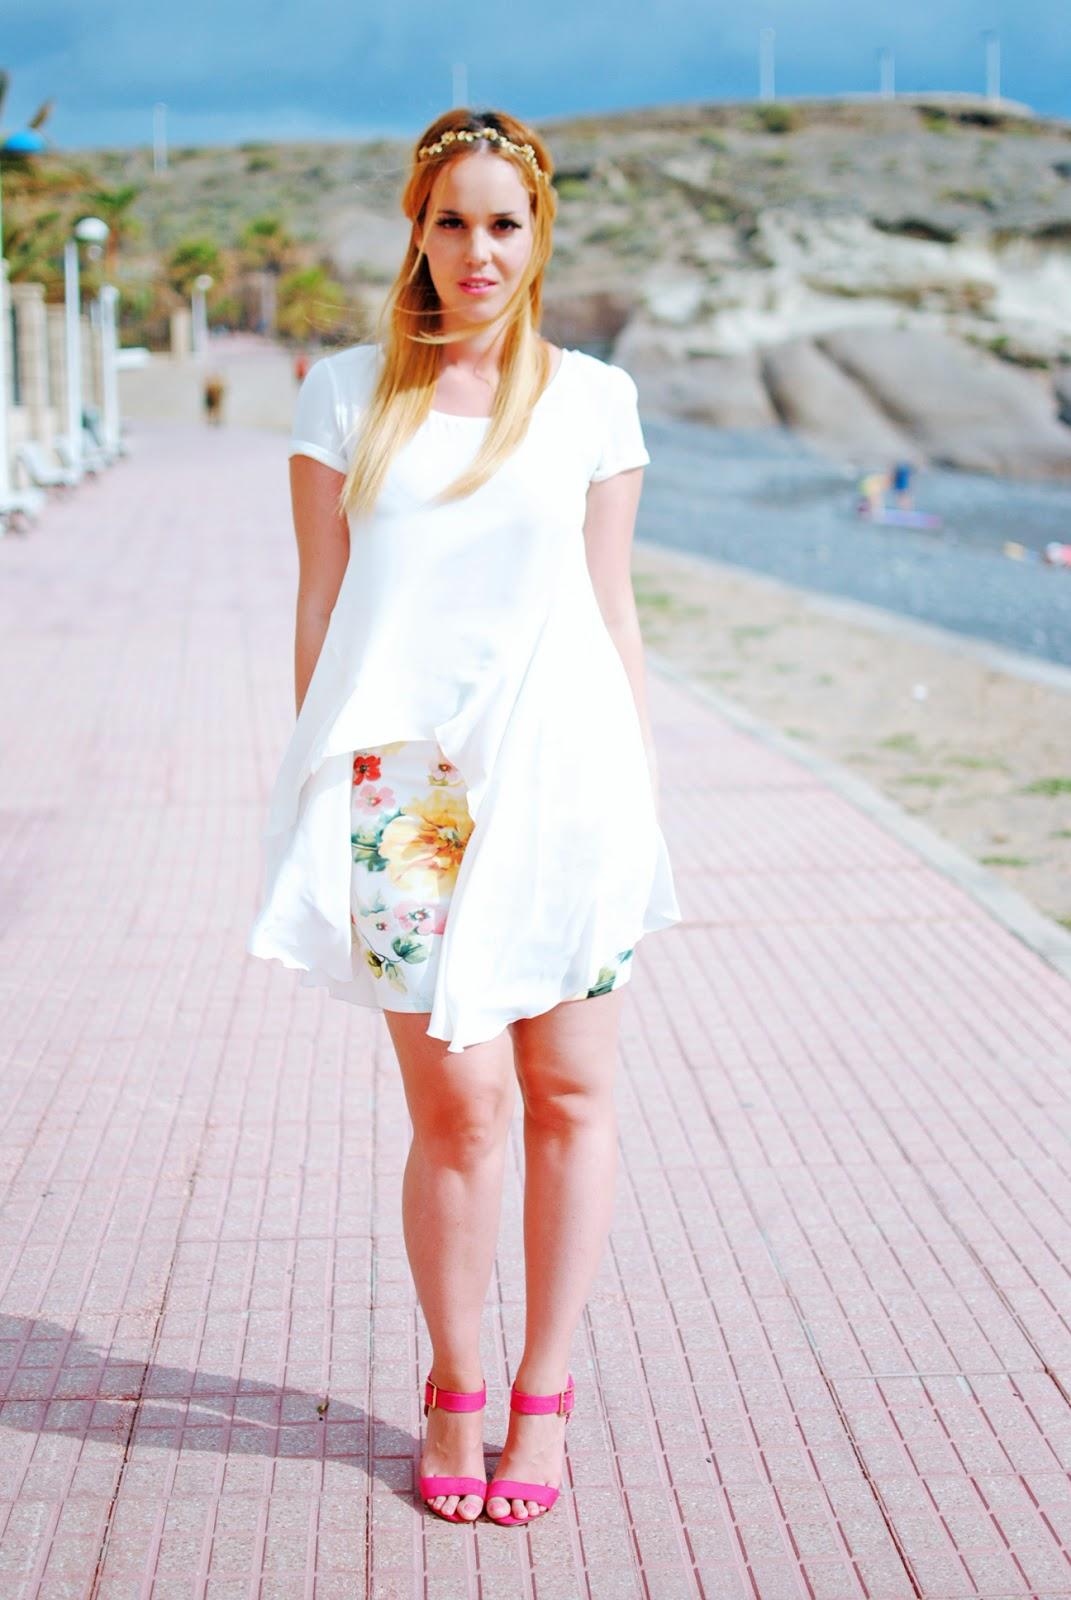 nery hdez, inlovewithfashion, floral print,primark tenerife, blonde, floral skirt, estampado de flores